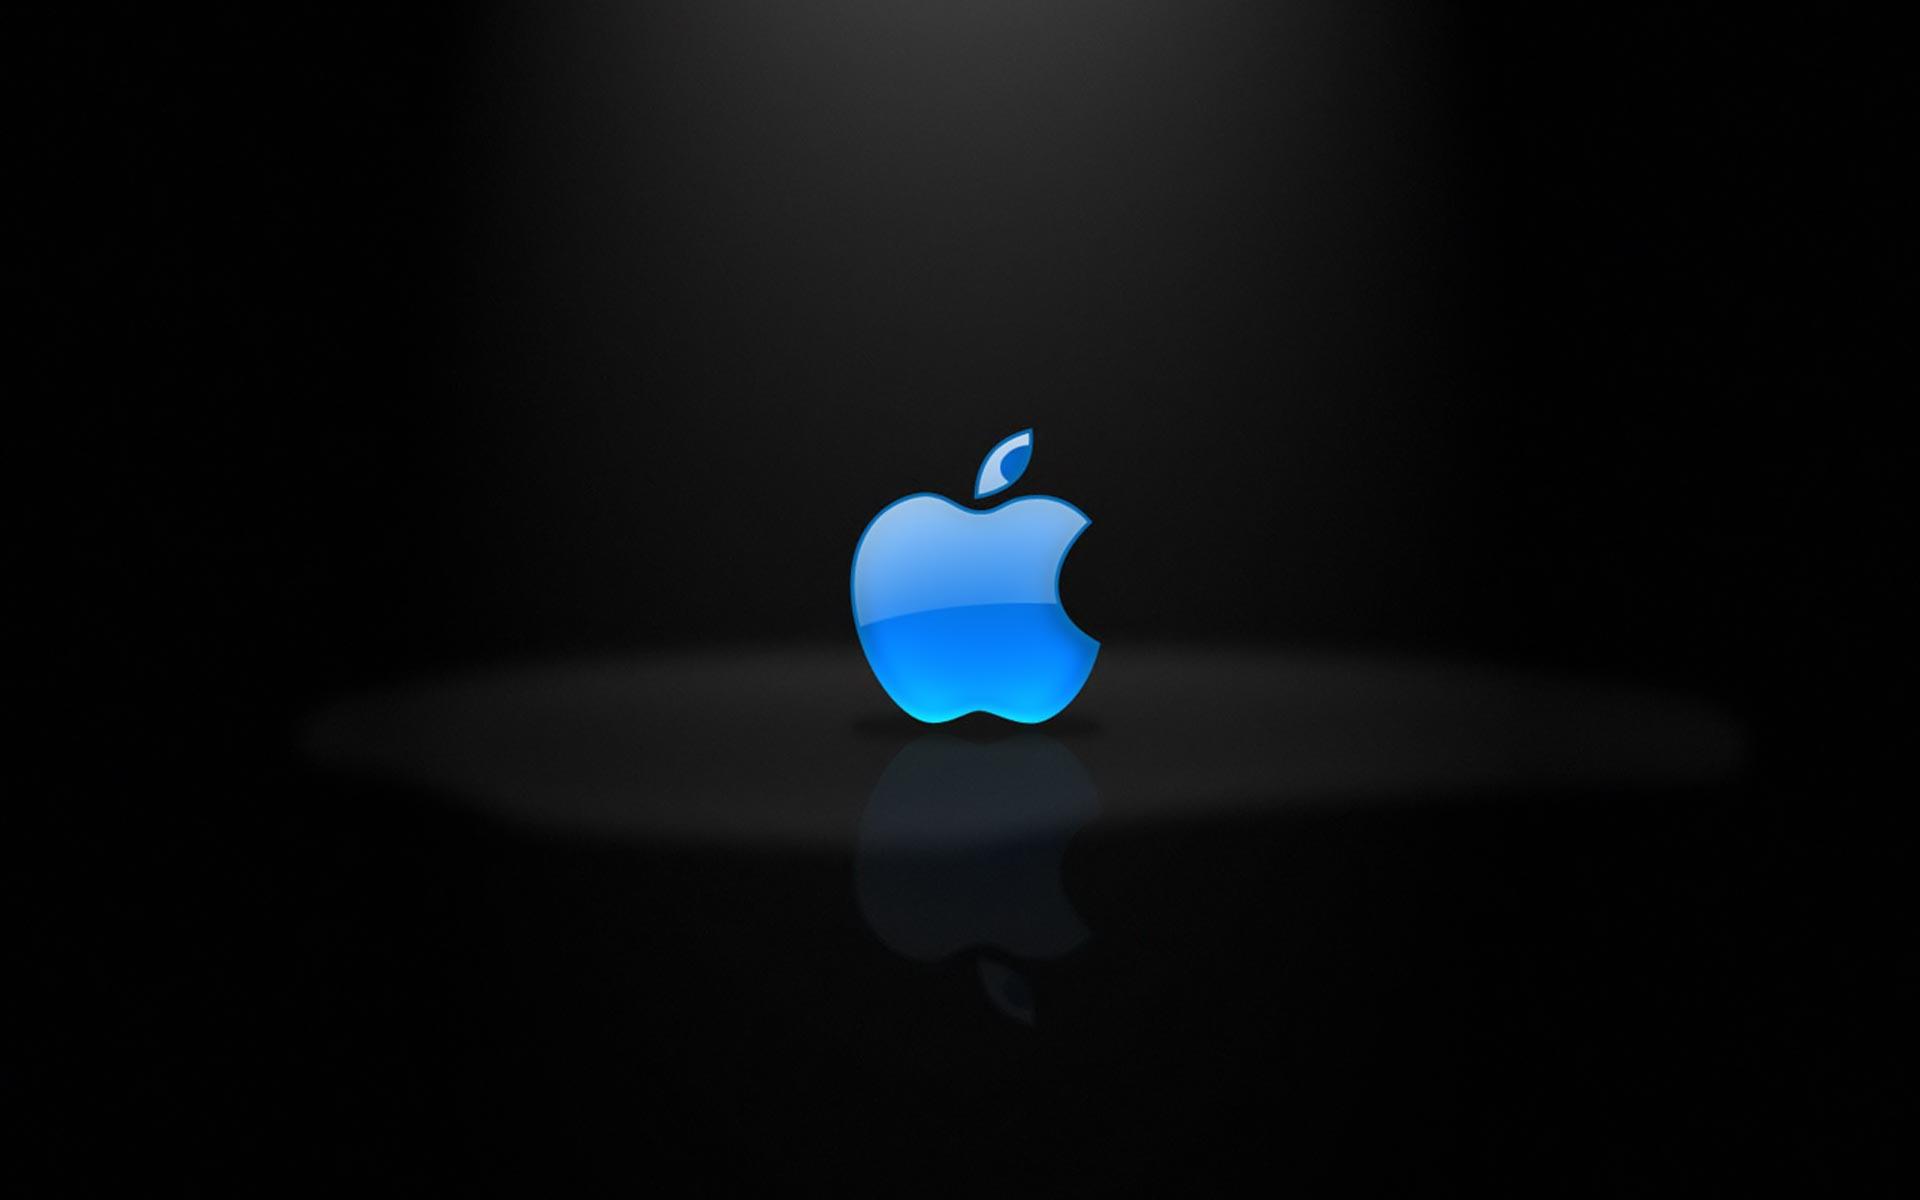 mac desktop backgrounds desktop backgrounds